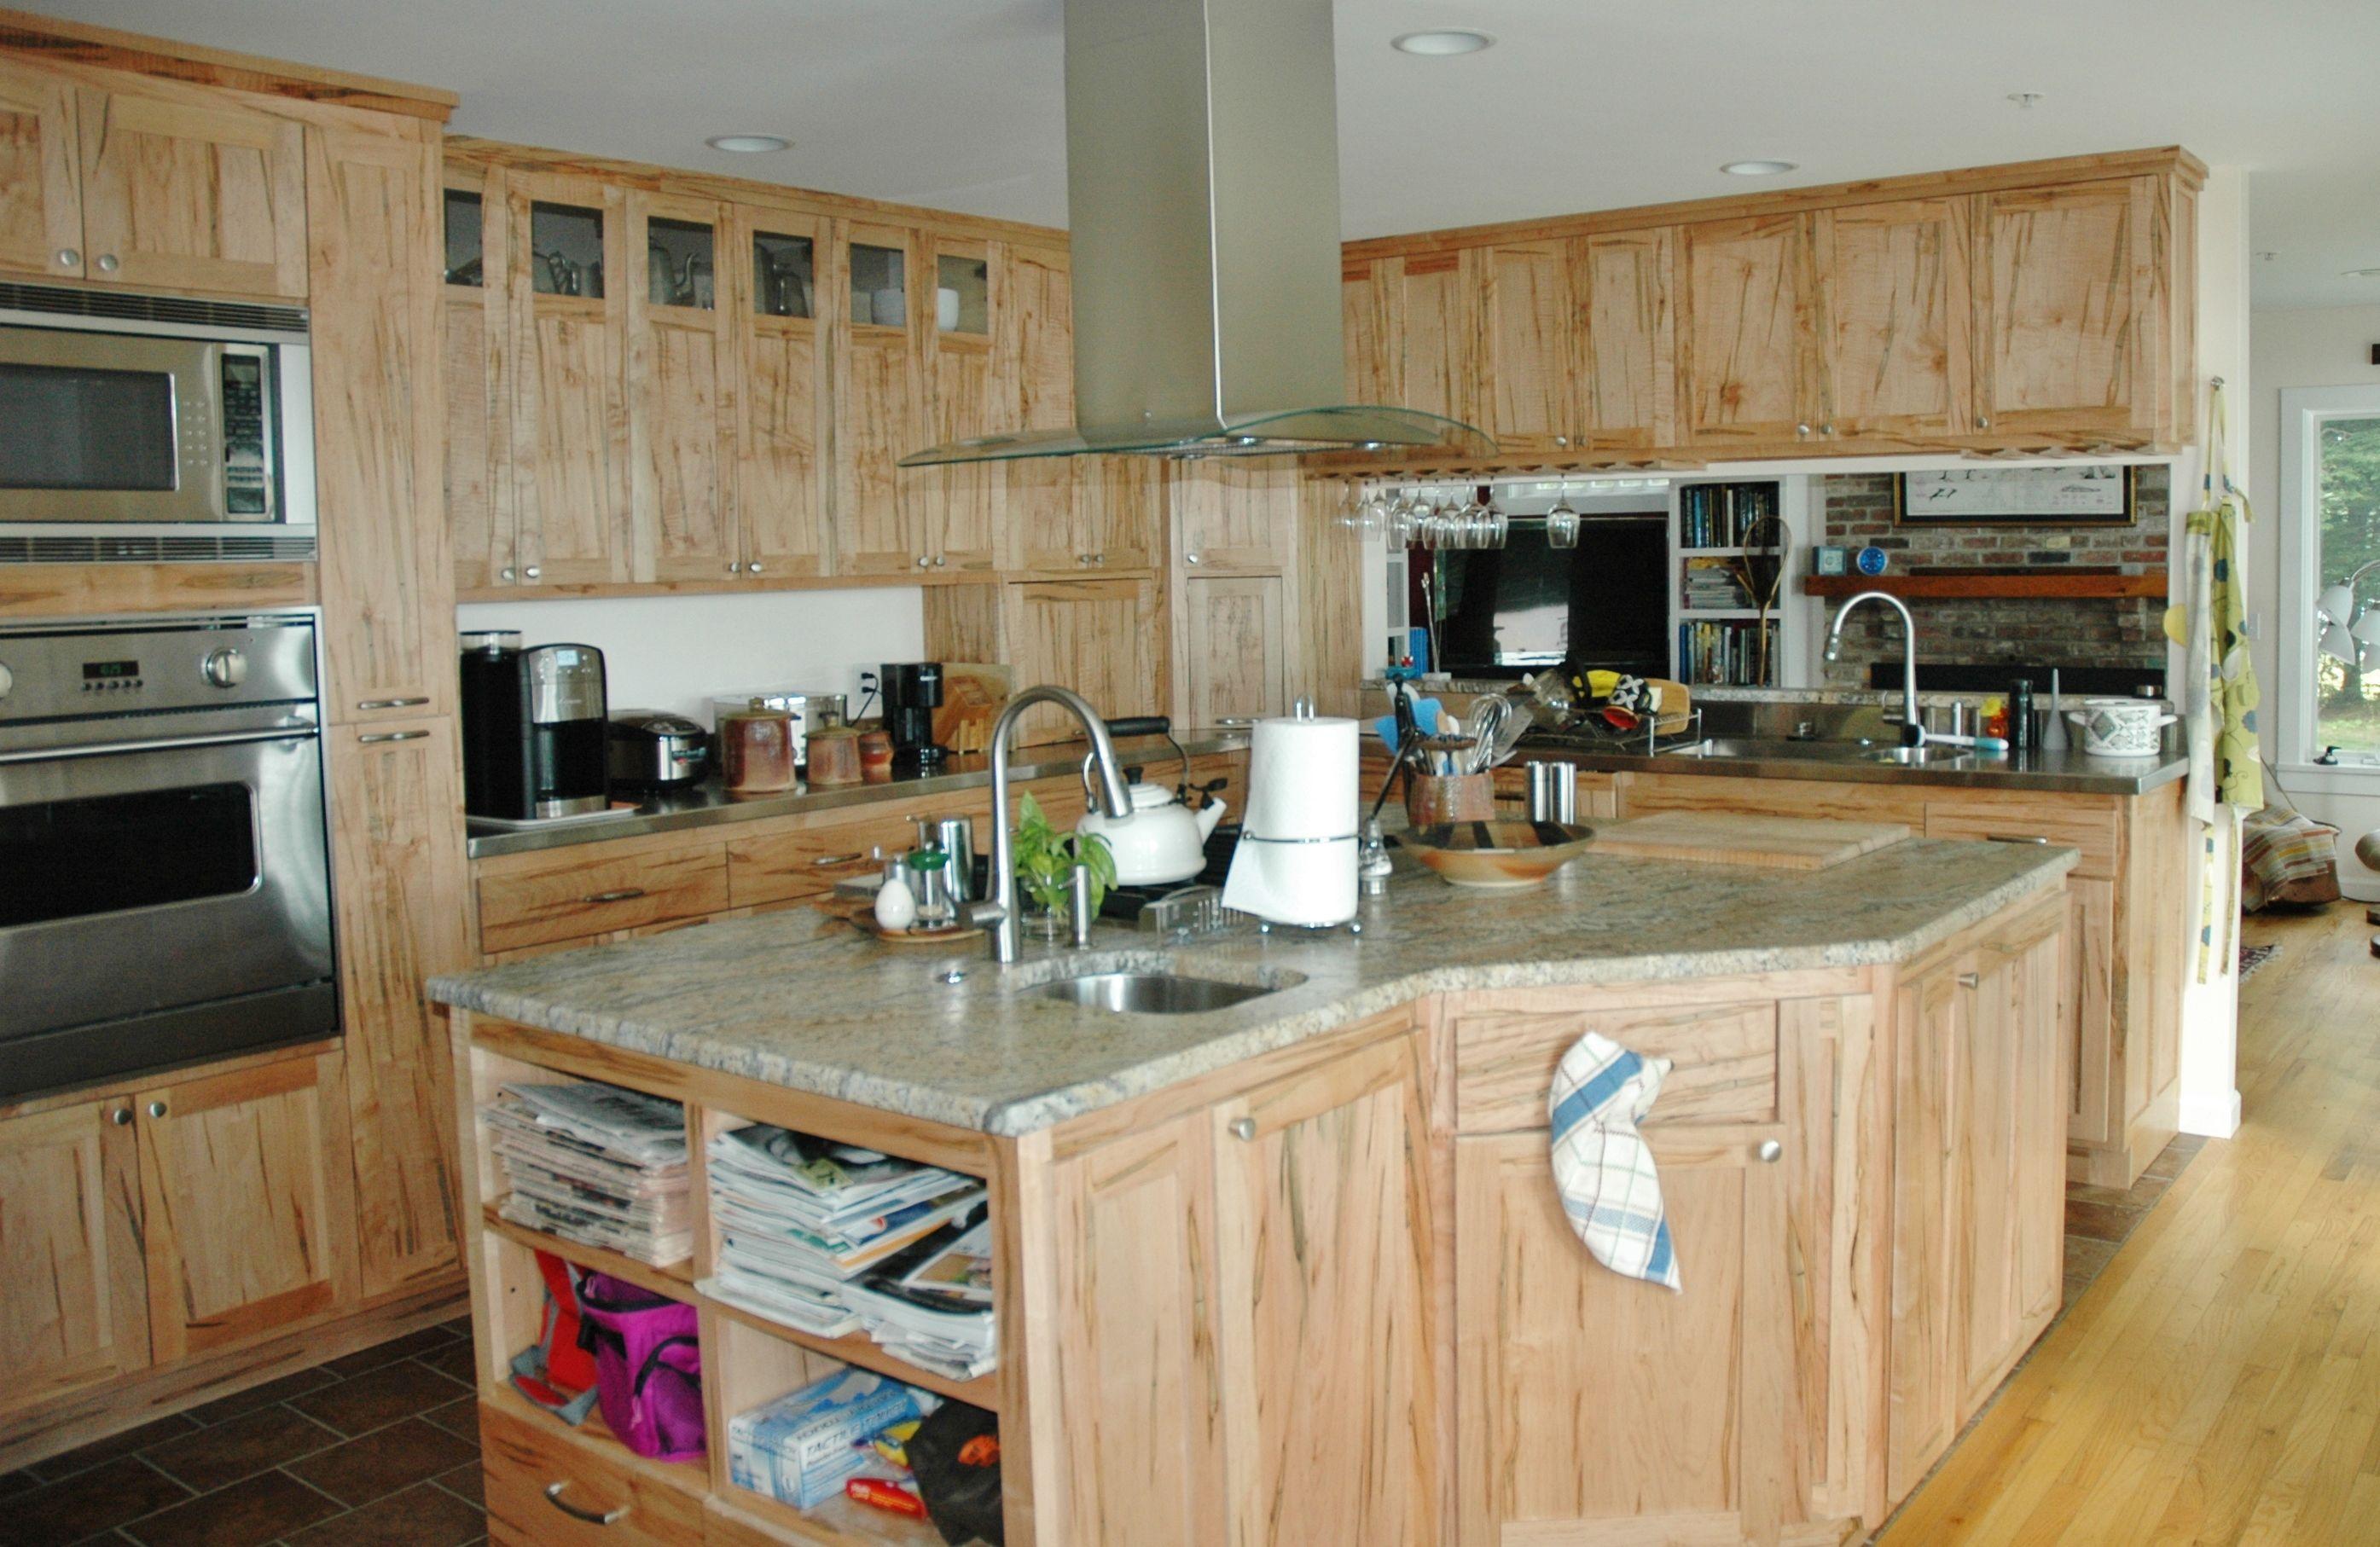 Custom Cabinets with Striking Grain in No. Bath, Maine ...